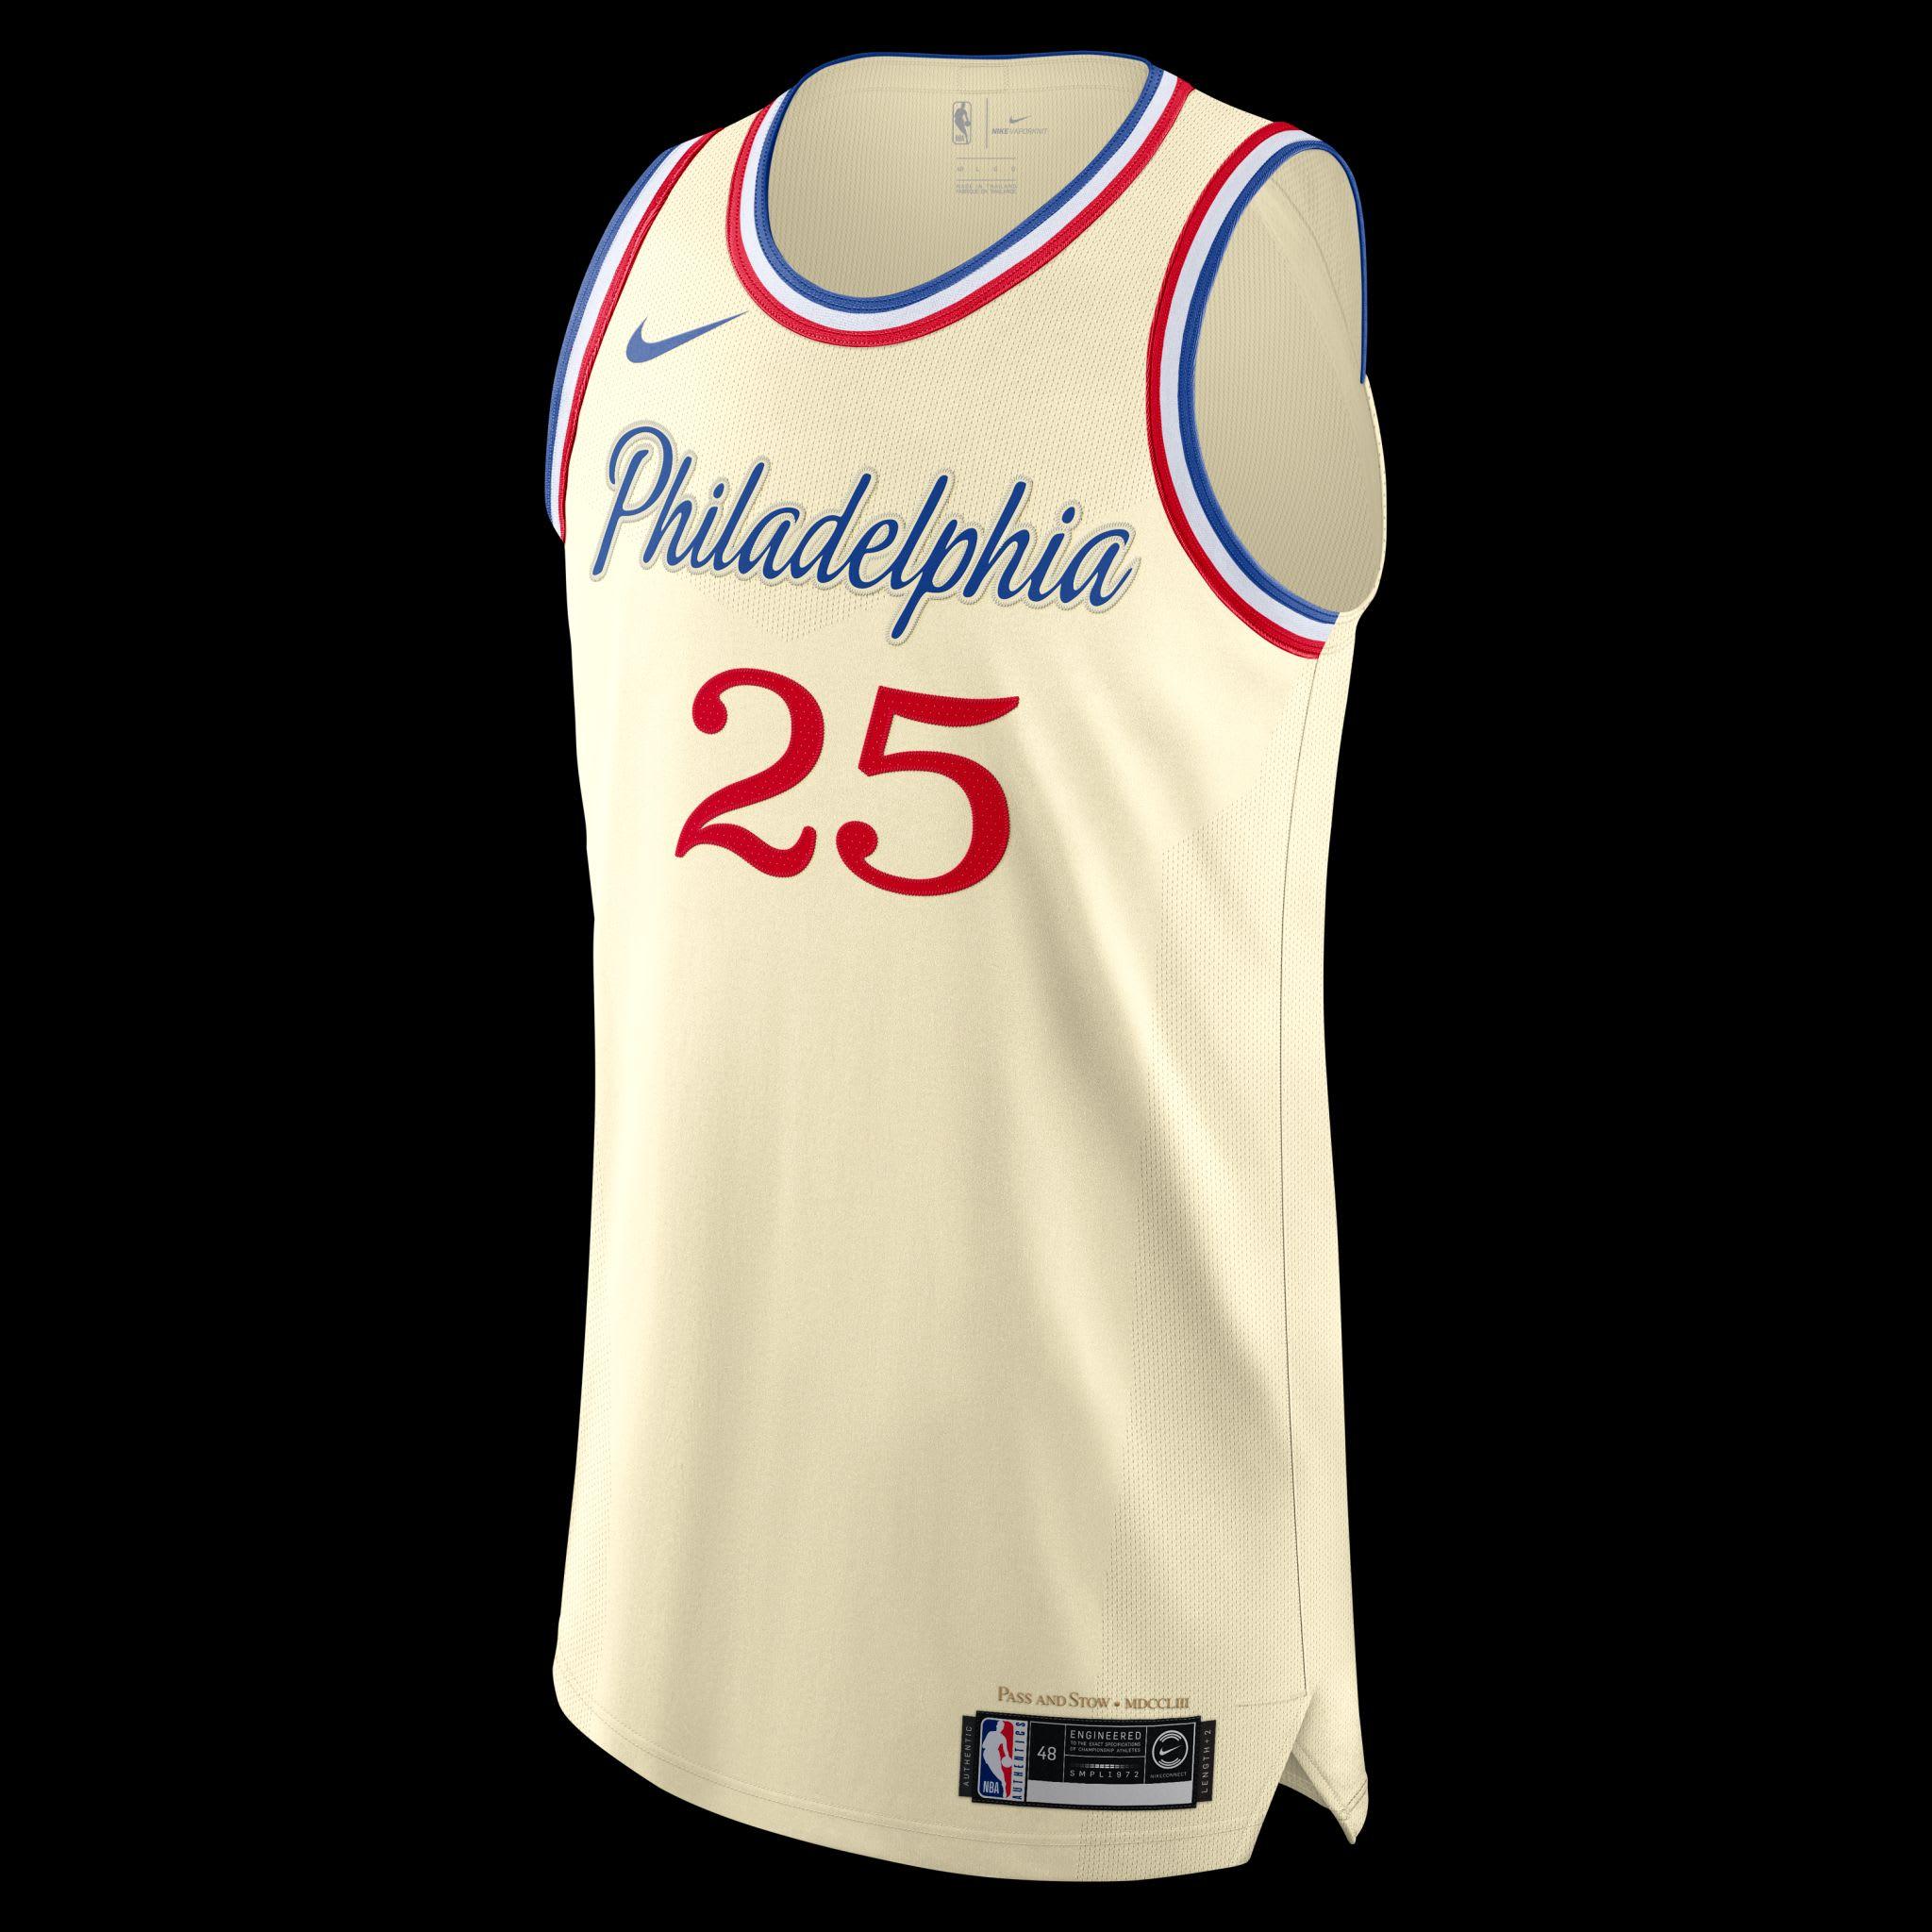 Get Your Philadelphia 76ers City Edition Jerseys Now